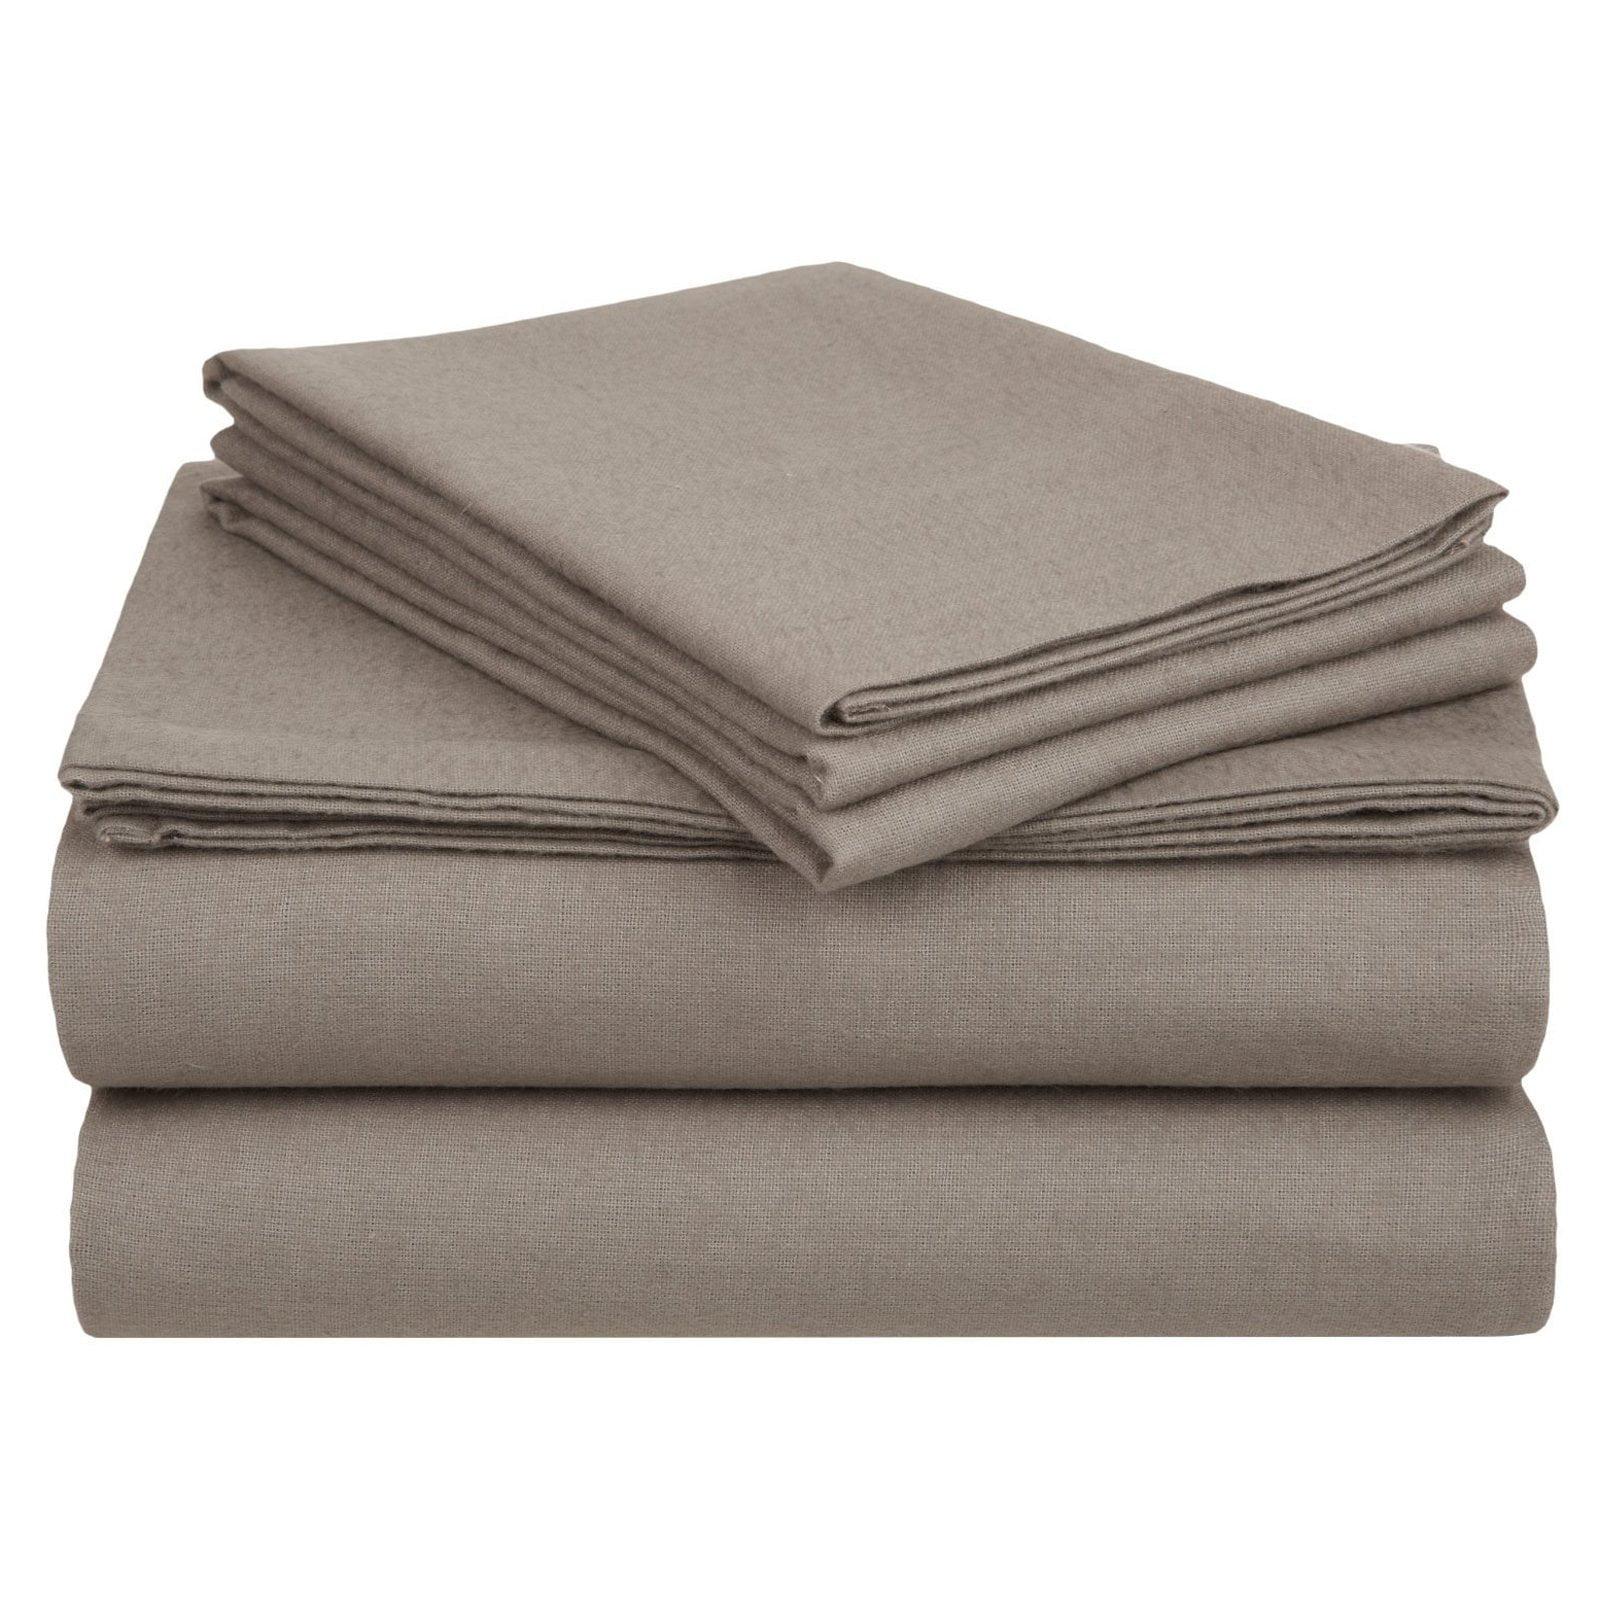 Superior Flannel Quality Cotton Paisley Sheet Set